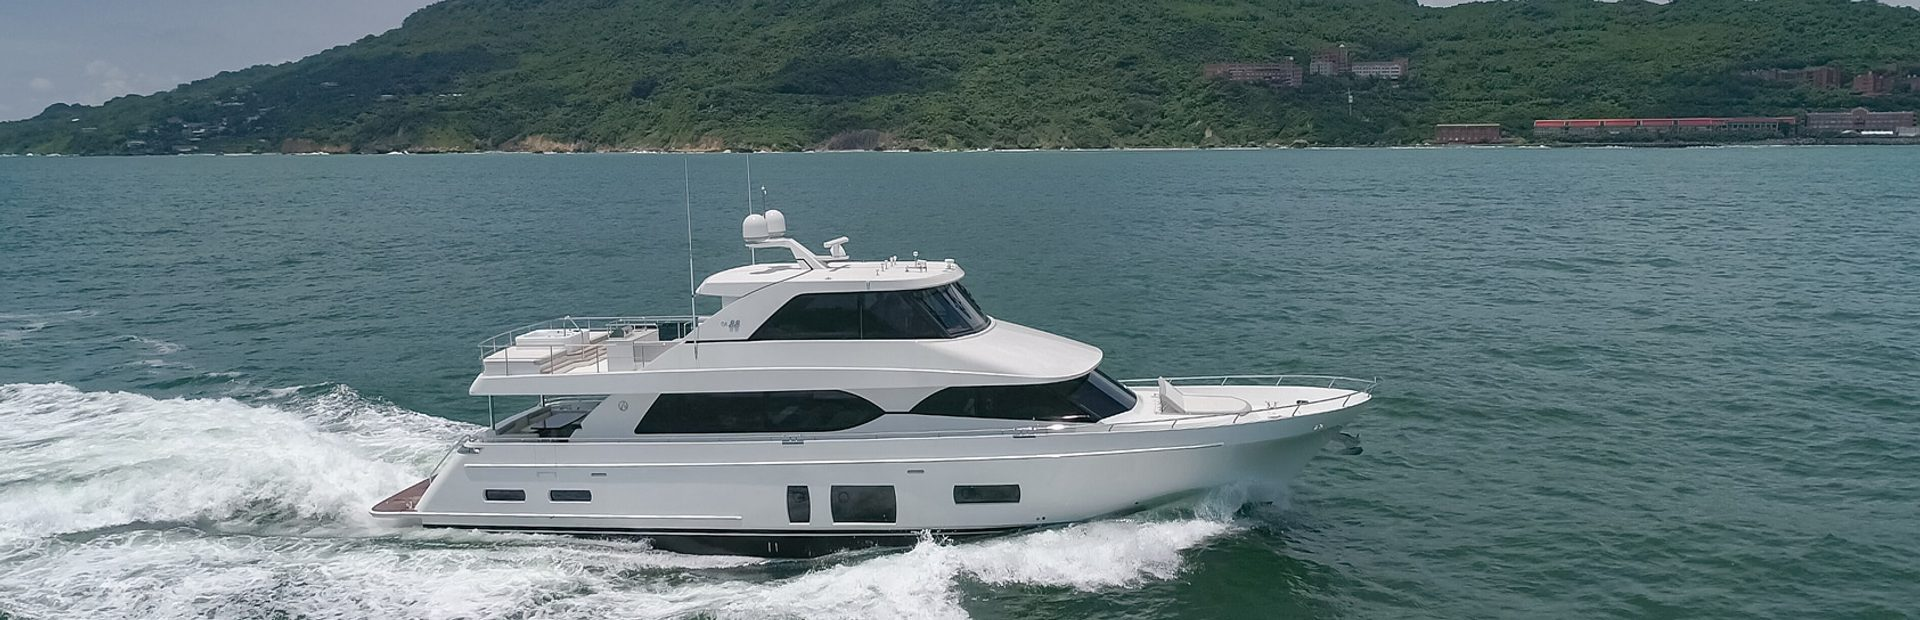 88 Skylounge SE Yacht Charter